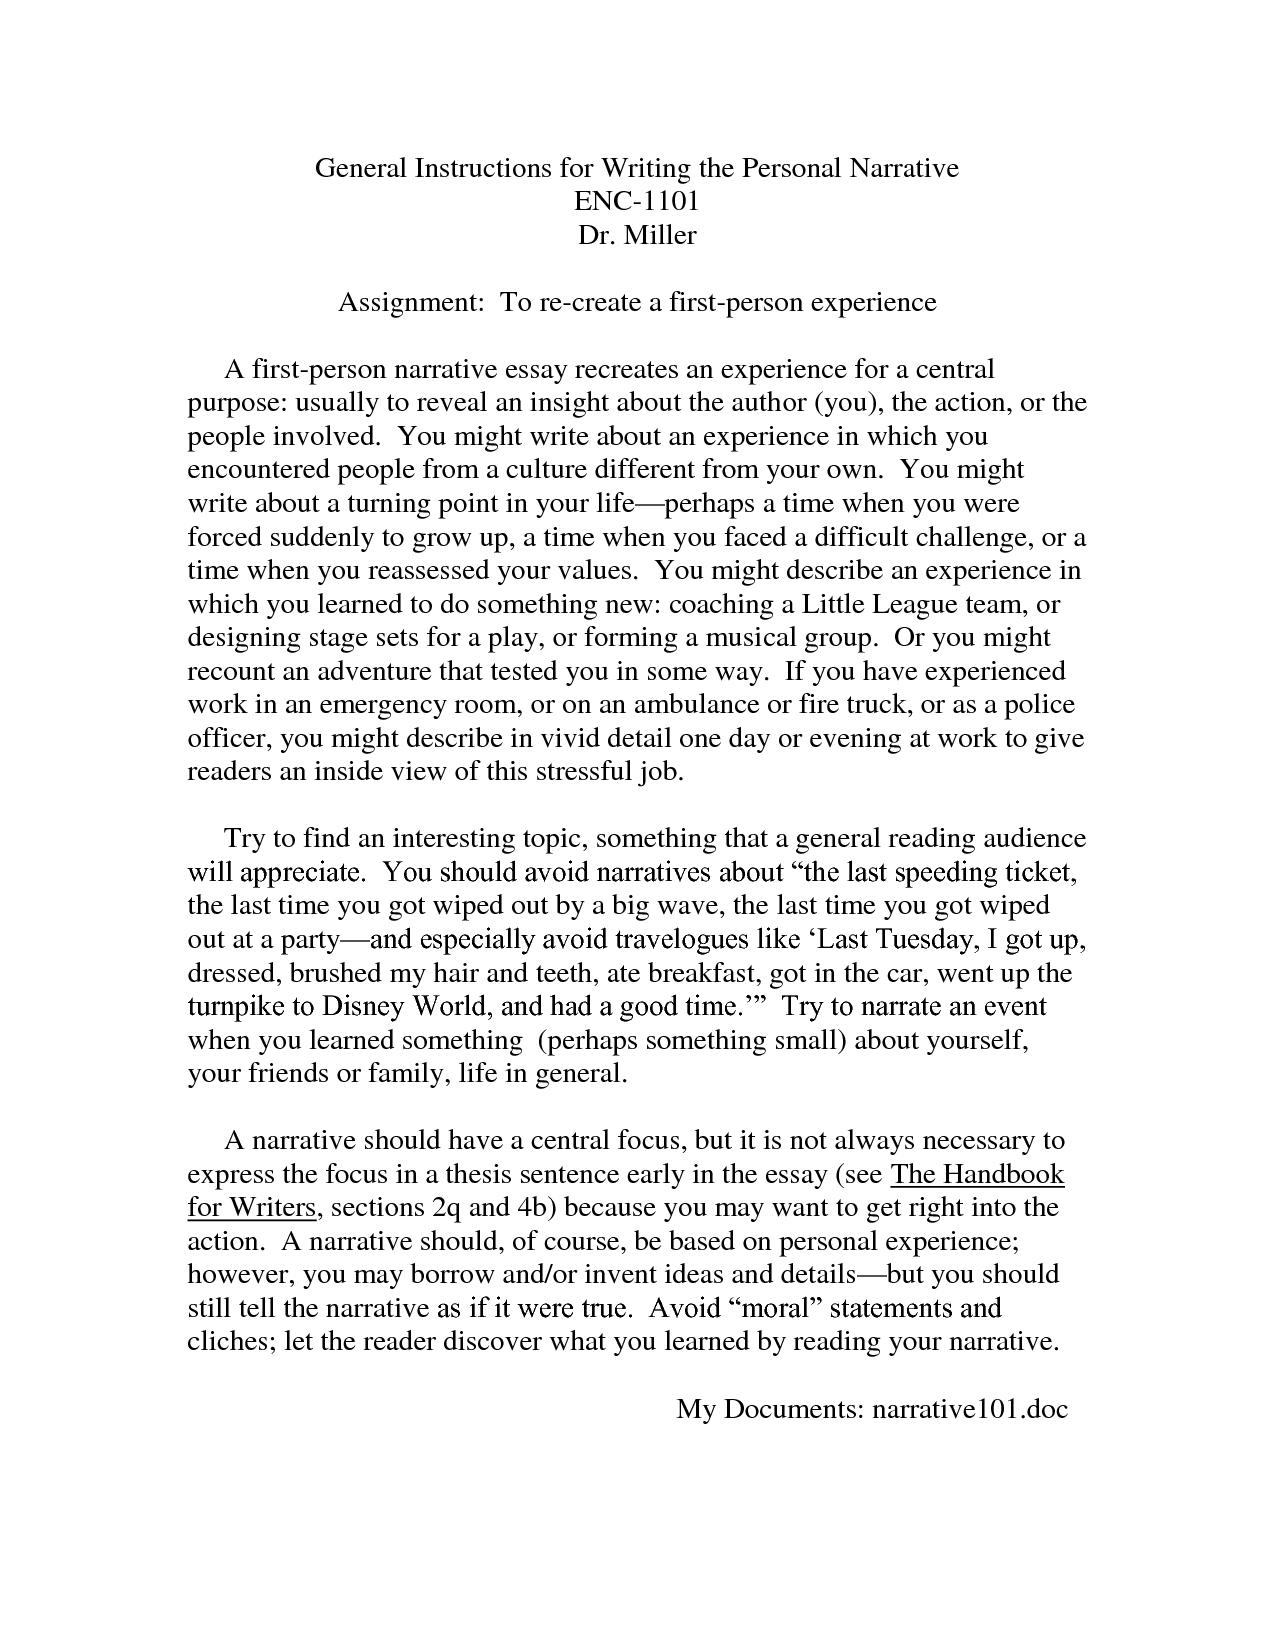 Race and ethnicity essays